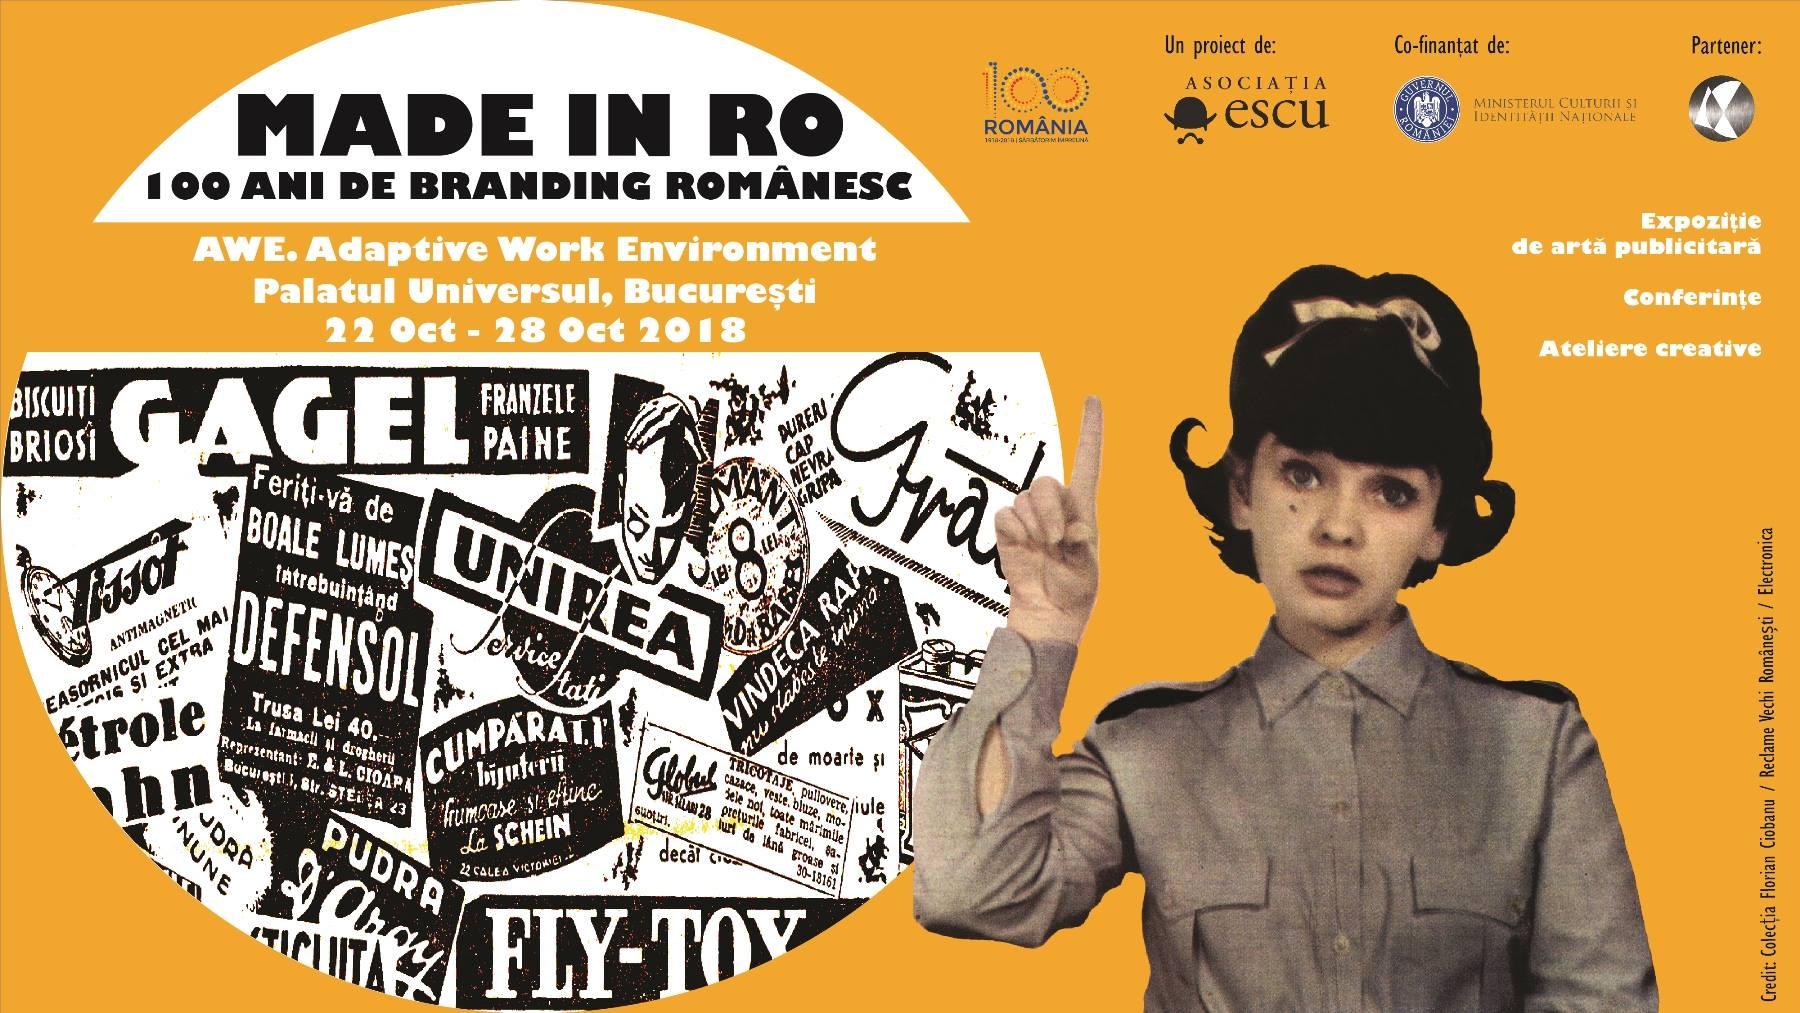 Made in RO: 100 ani de branding romanesc